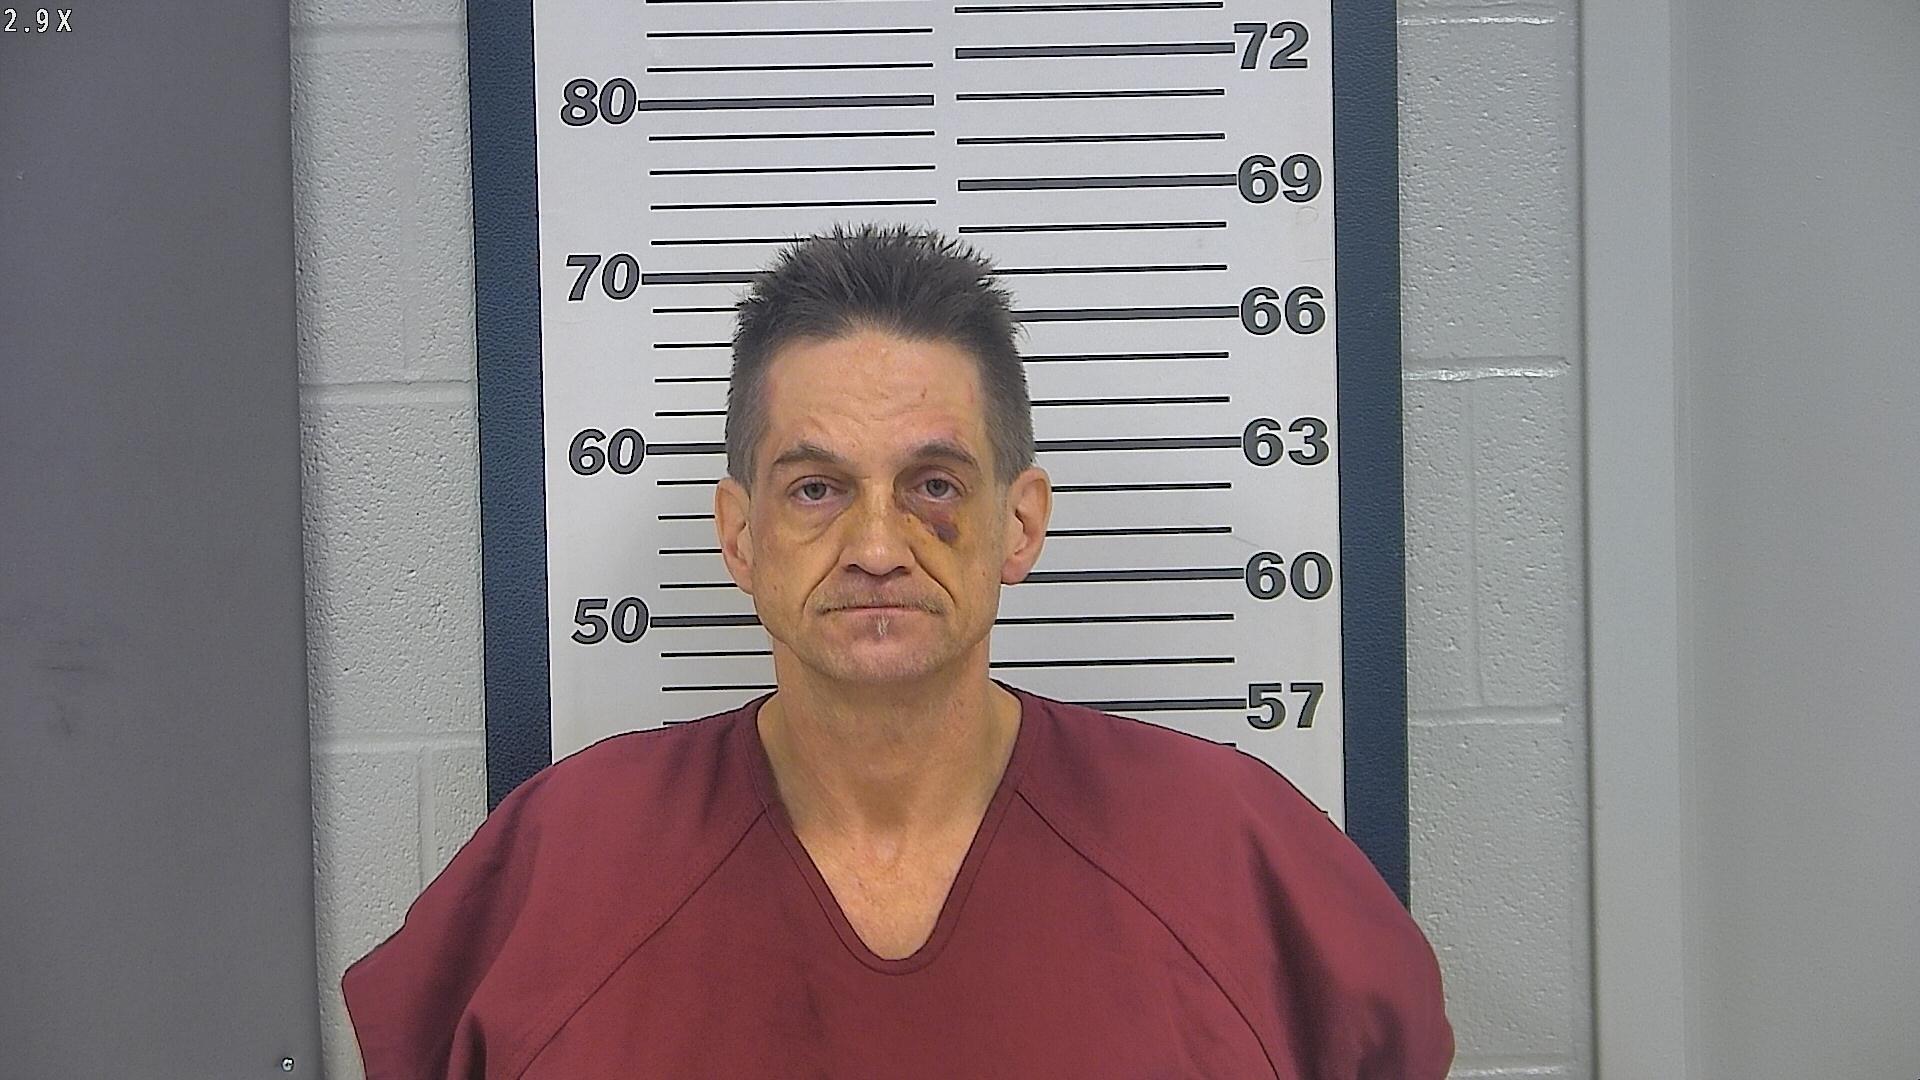 Bobby Jo Dennison's mugshot. (Via the Platte County Prosecuting Attorney)